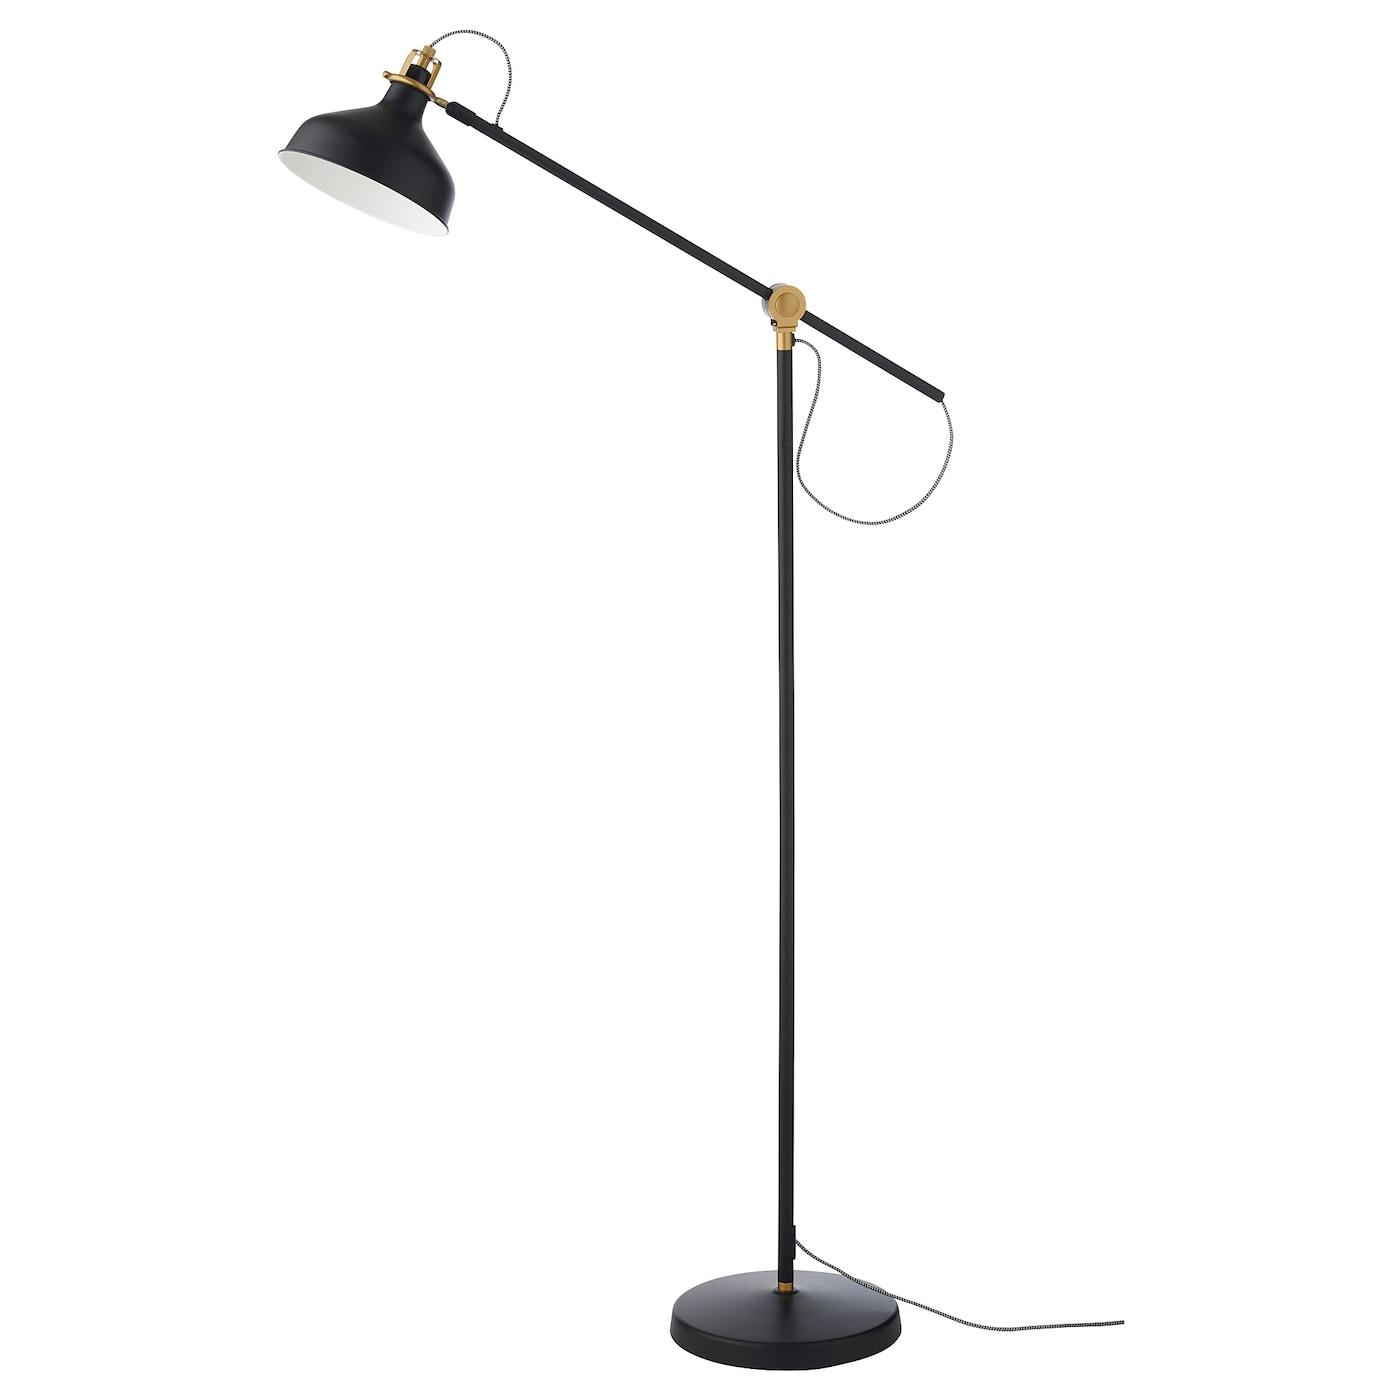 RANARP   Lampen > Tischleuchten > Leseleuchten   IKEA